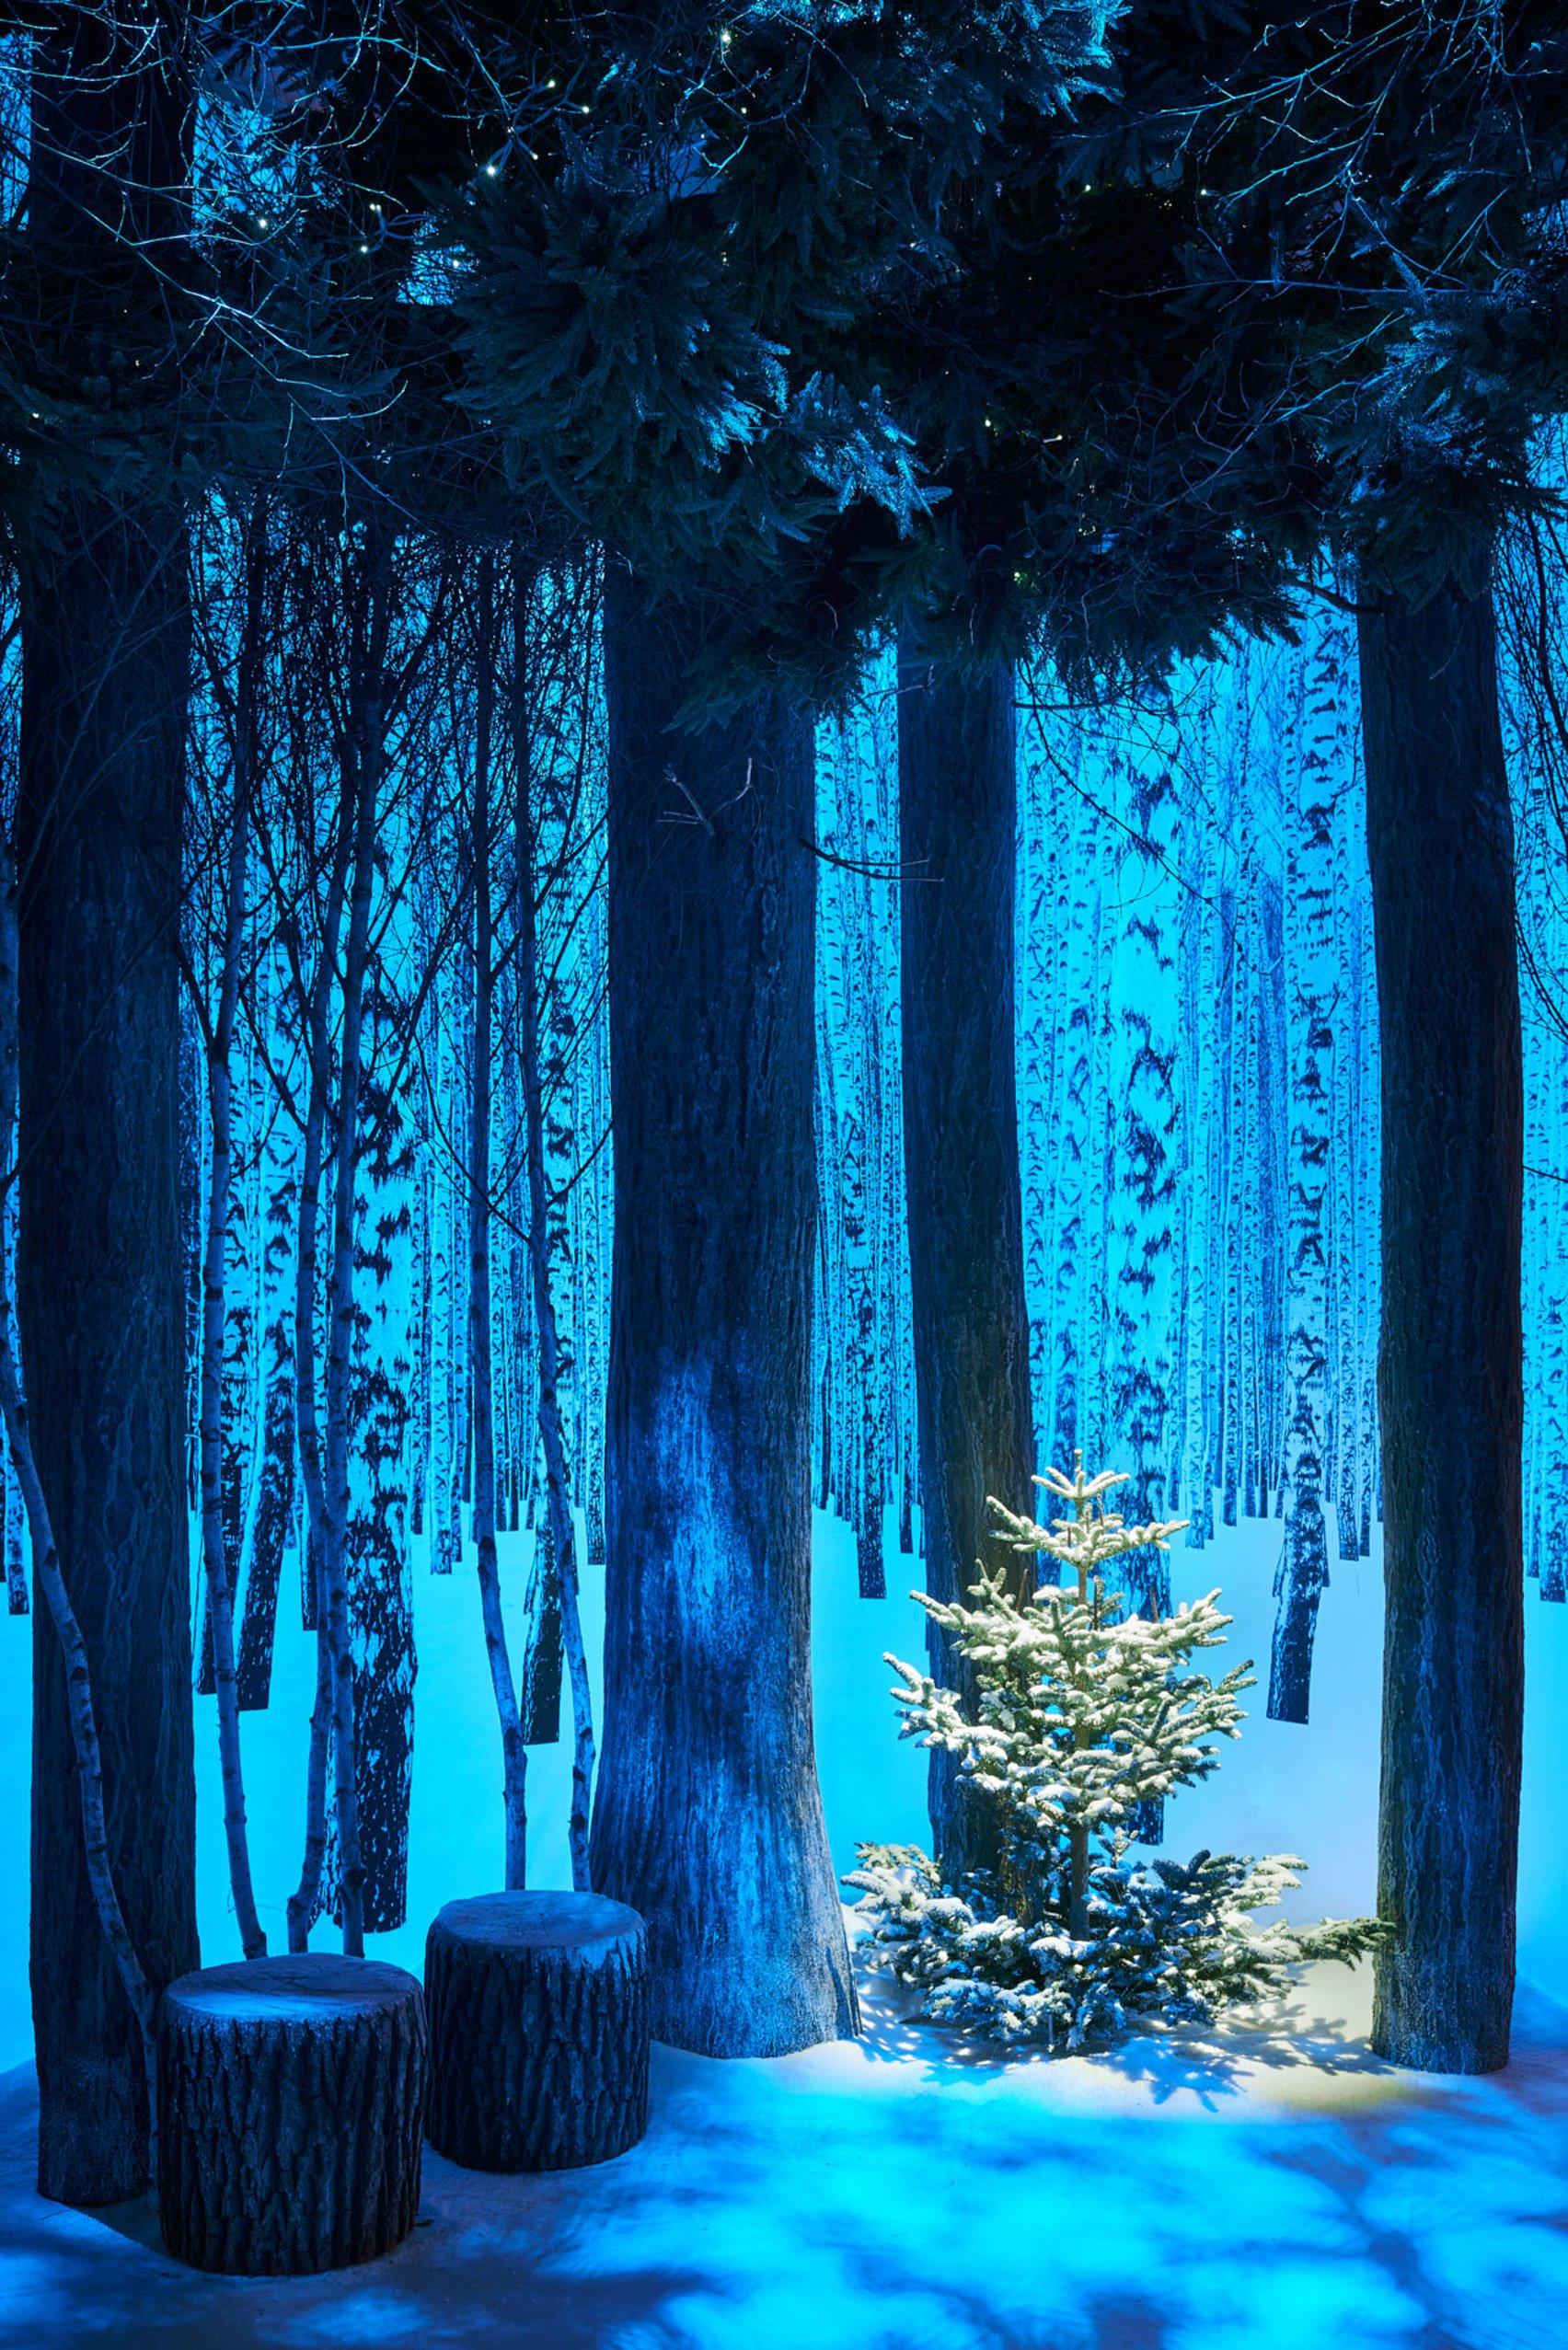 jony-ive-marc-newson-christmas-tree-design-claridges-london_dezeen_1704_col_4